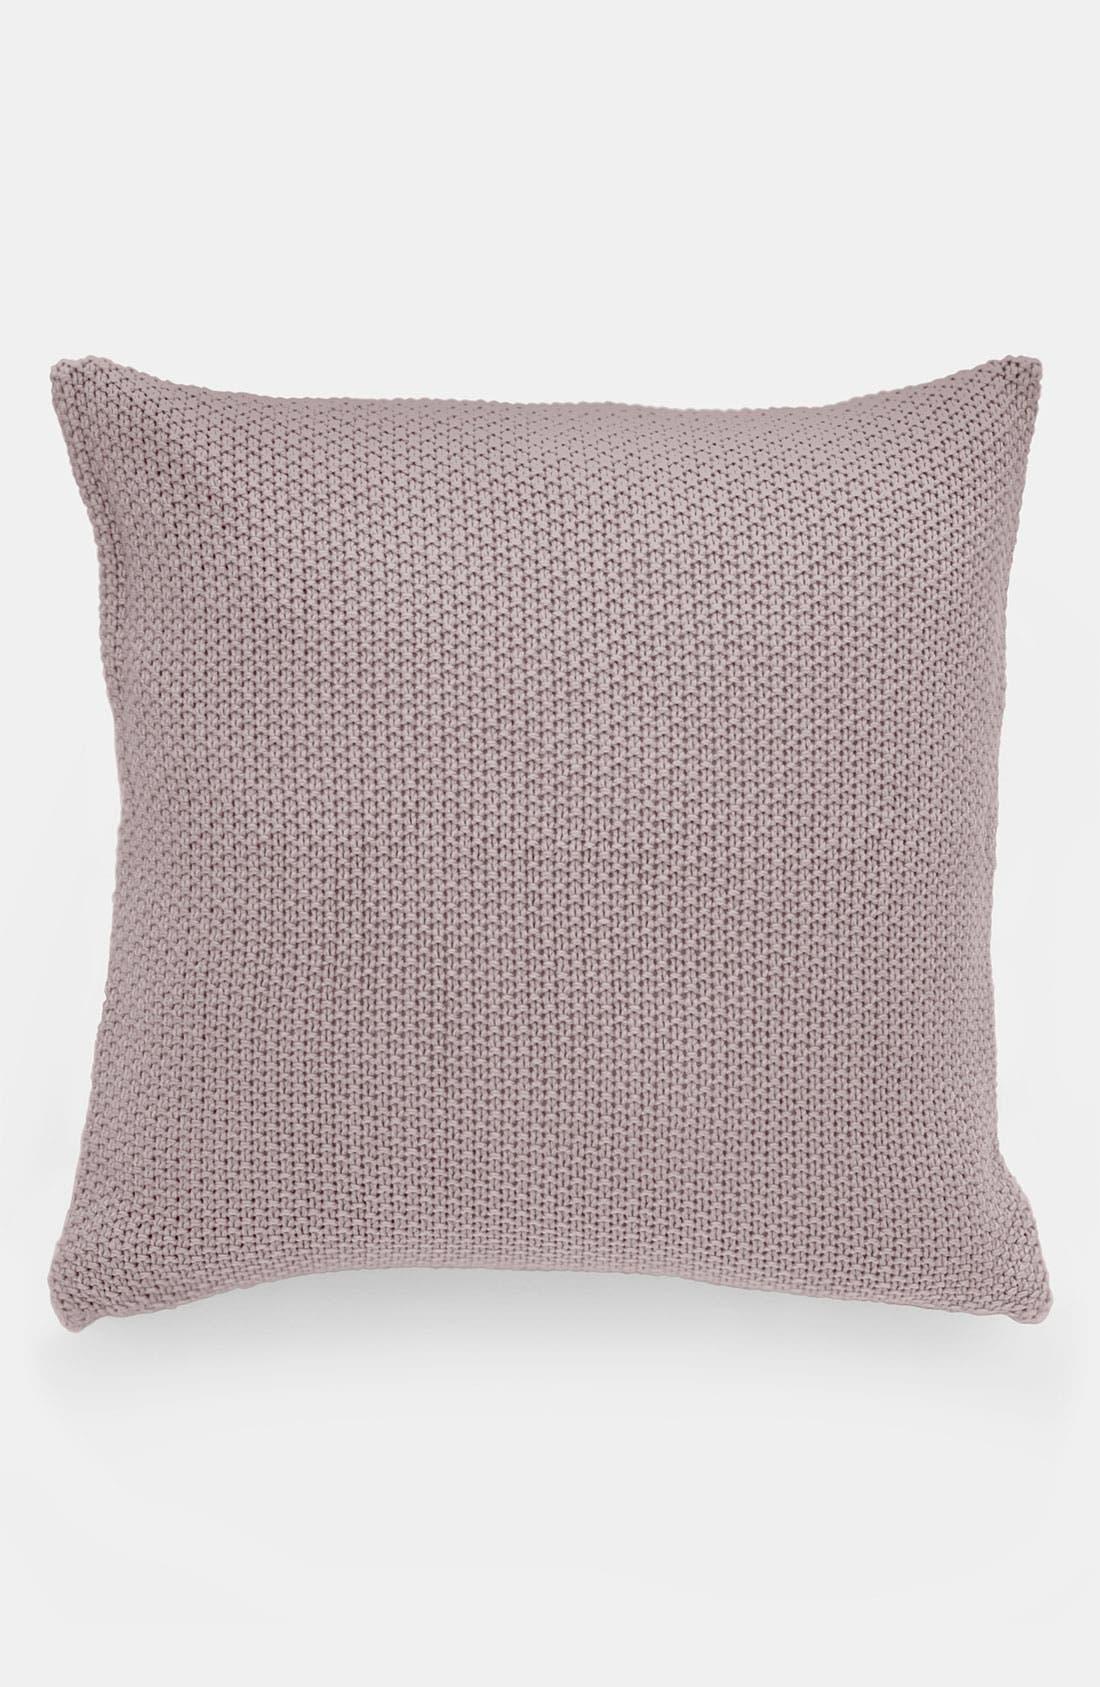 Alternate Image 1 Selected - Donna Karan 'The Essential' Euro Pillow Sham